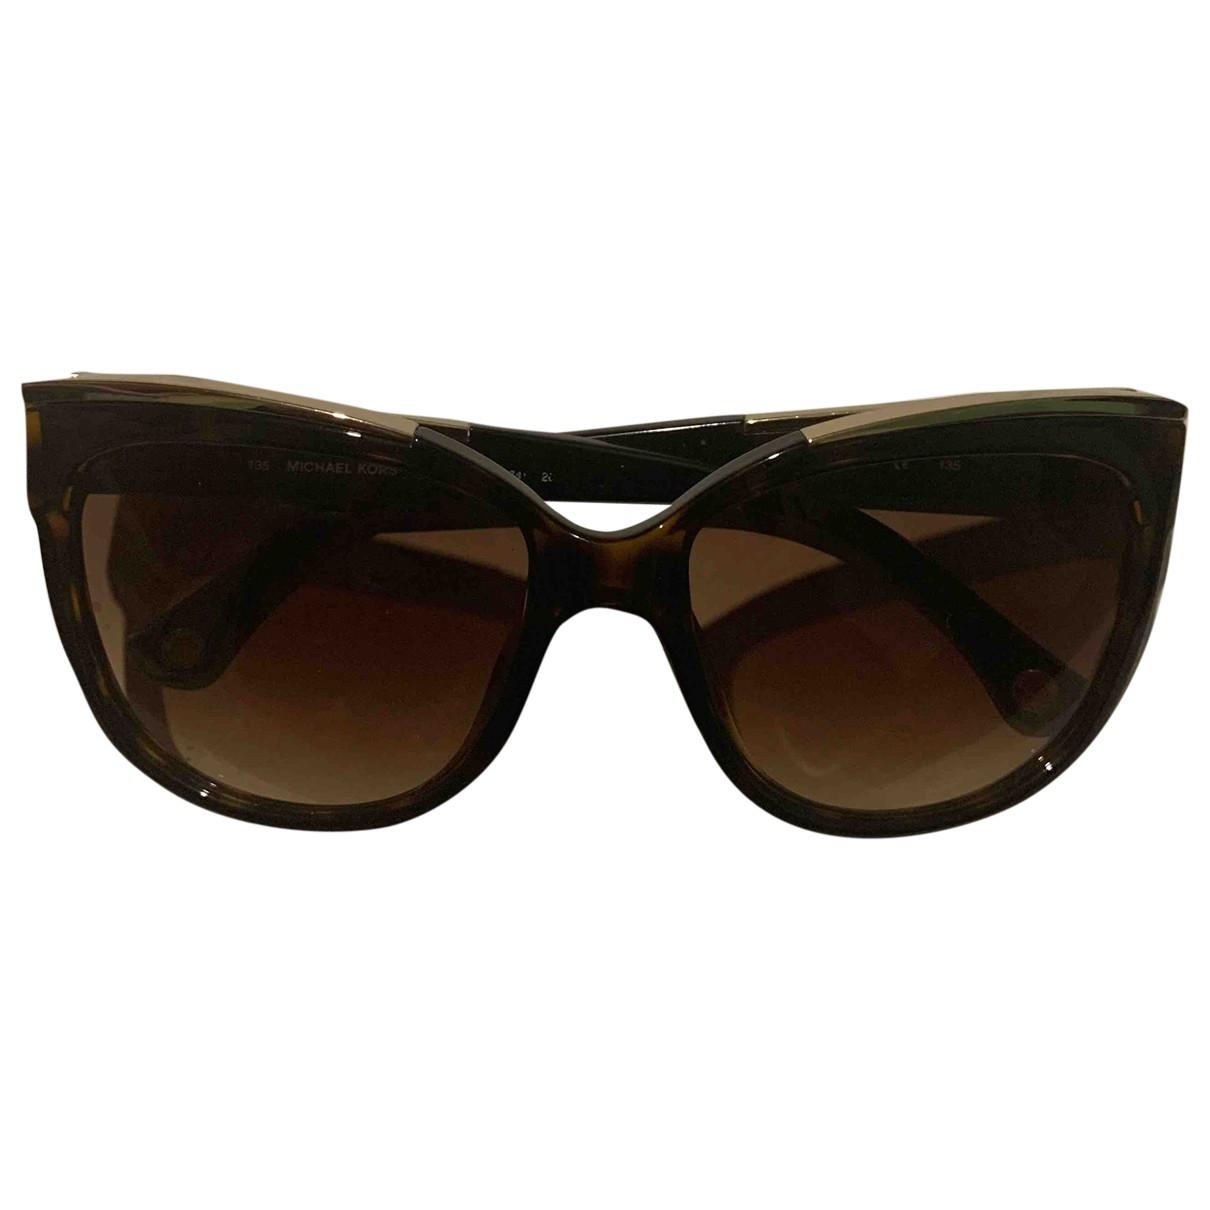 Michael Kors \N Brown Sunglasses for Women \N